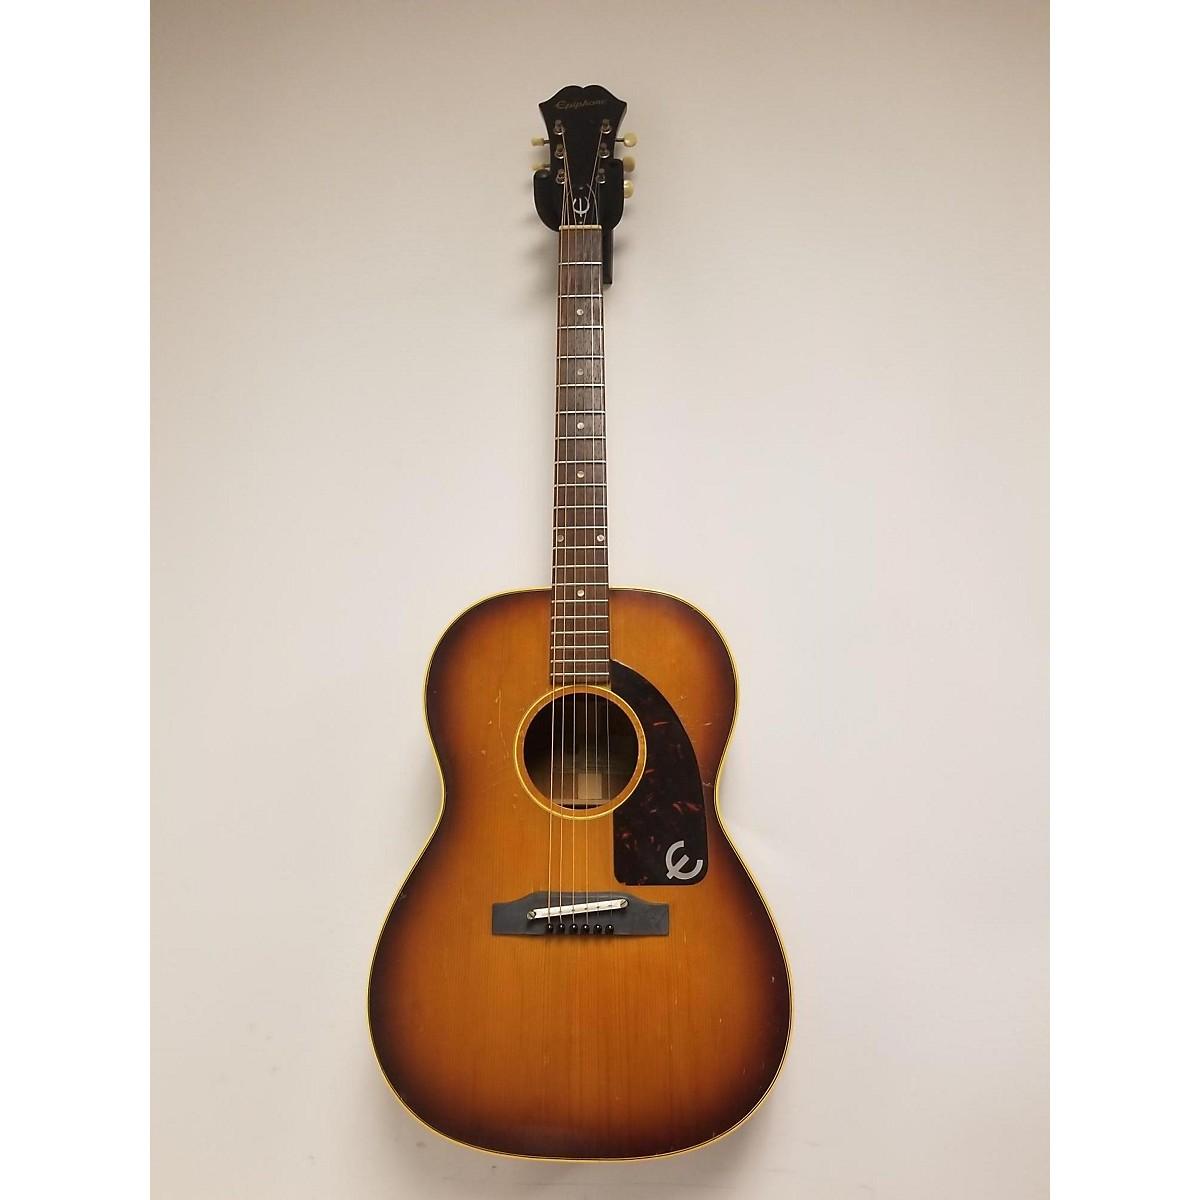 Epiphone 1964 FT-45 Acoustic Guitar